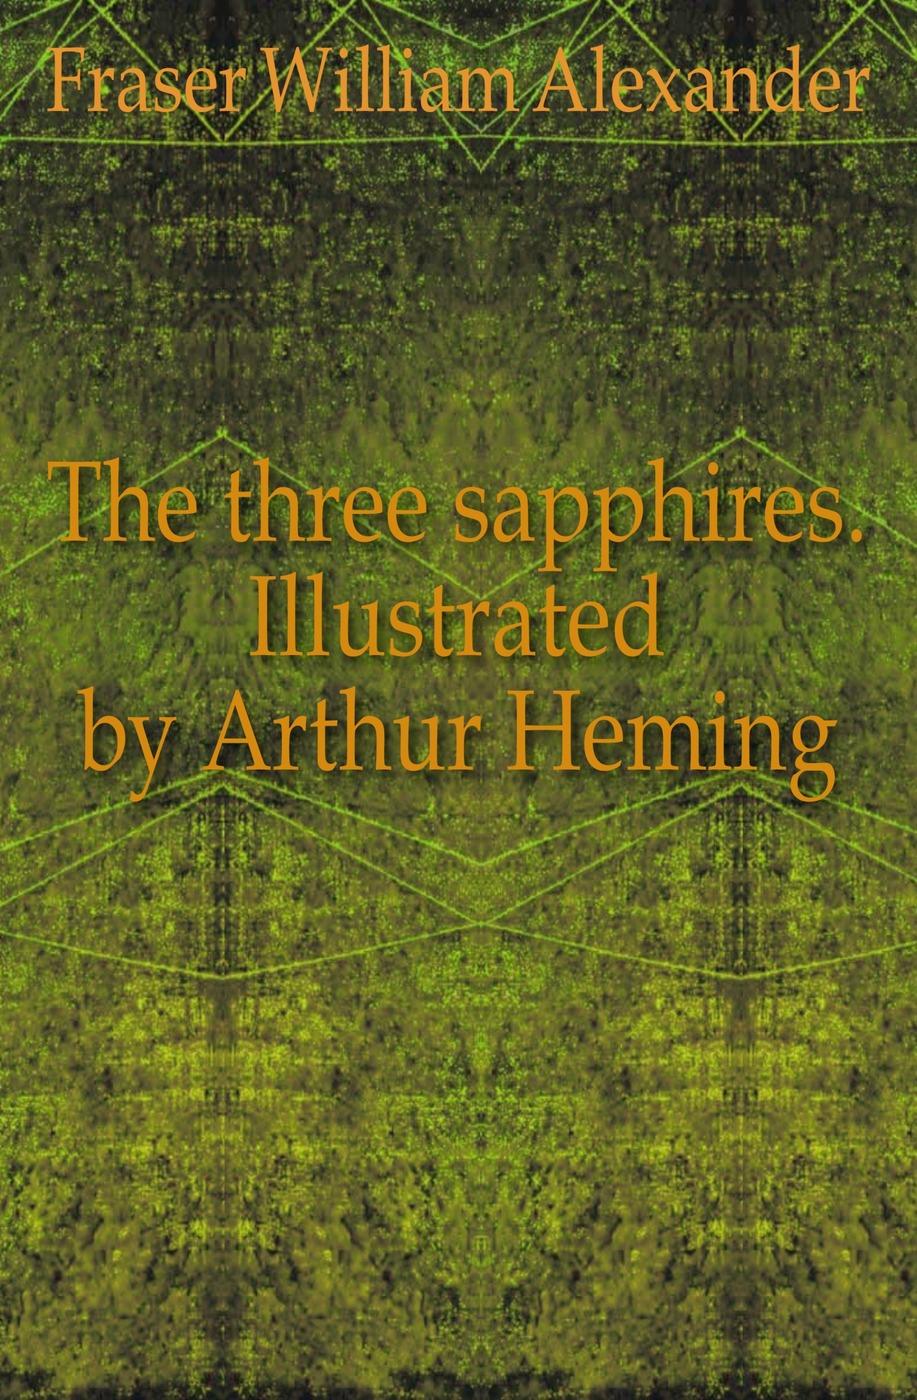 все цены на Fraser William Alexander The three sapphires. Illustrated by Arthur Heming онлайн